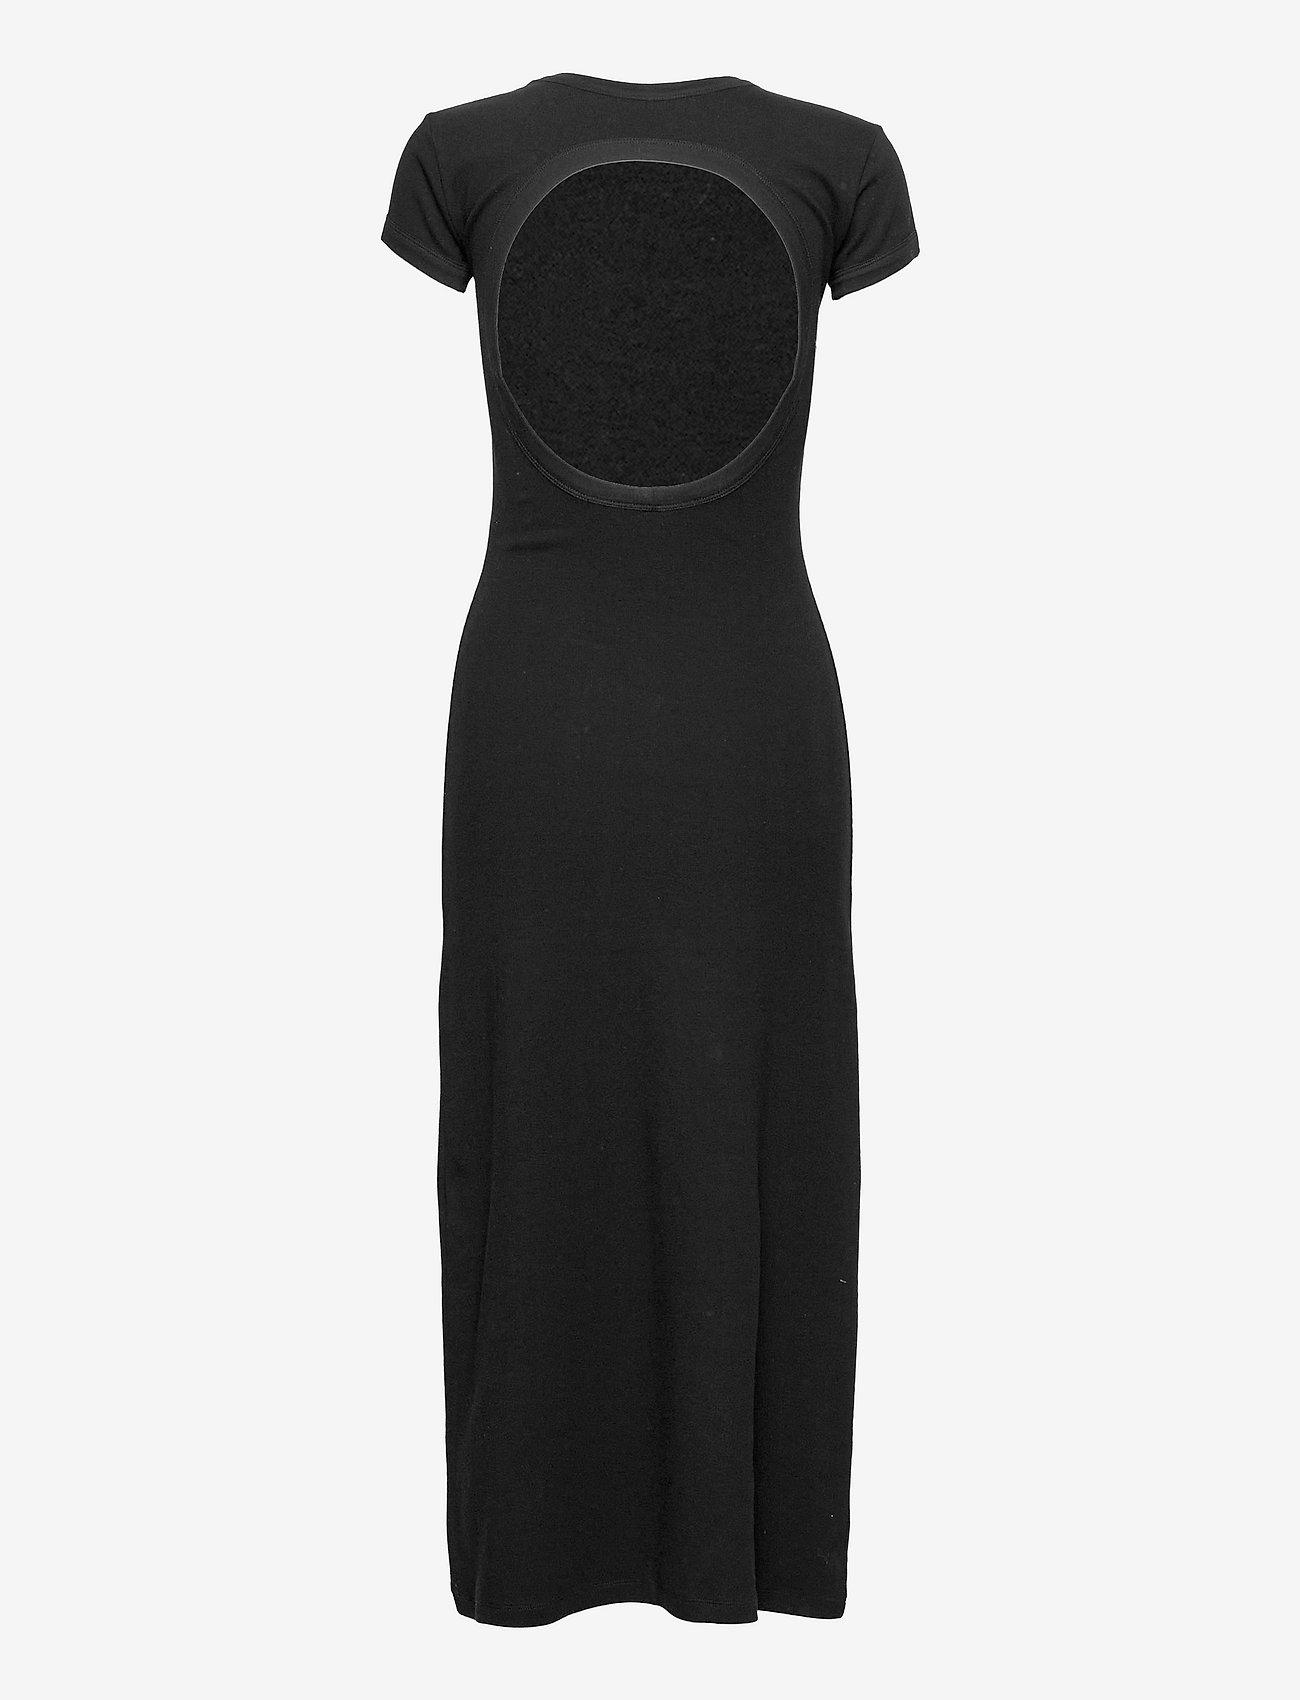 AllSaints - FRANKIE DRESS - maxi dresses - black - 1